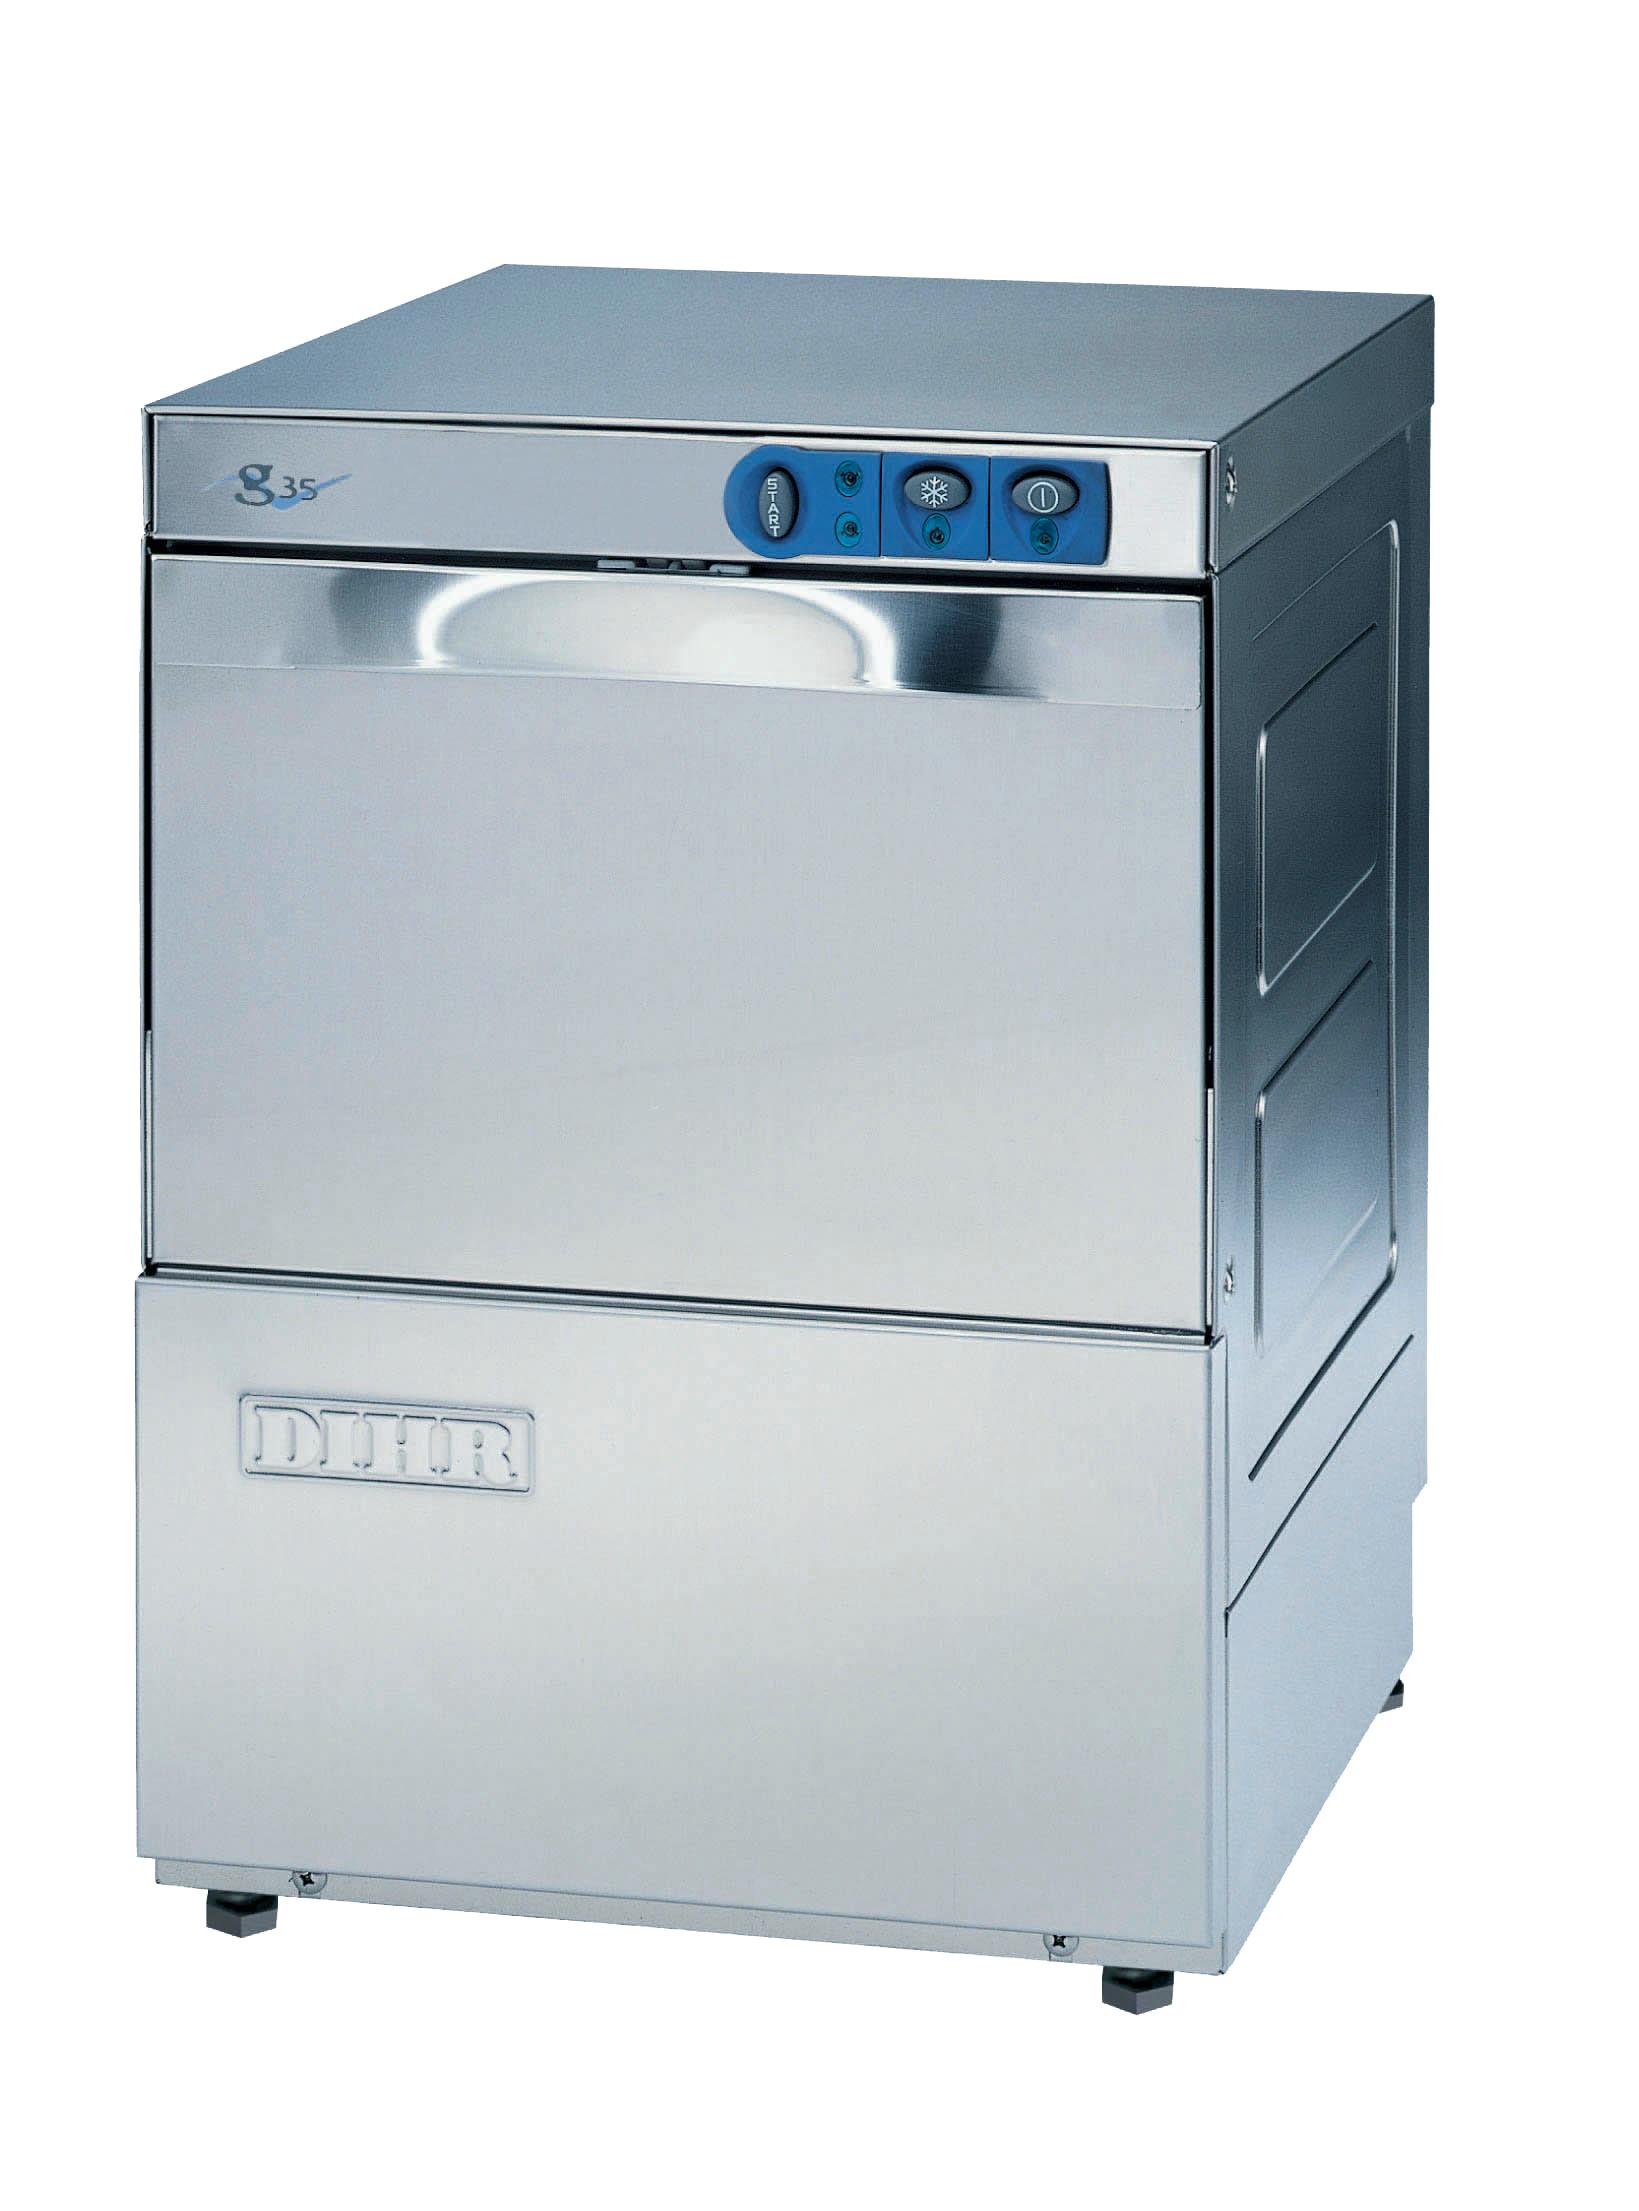 Undercounter Dishwasher- Compact